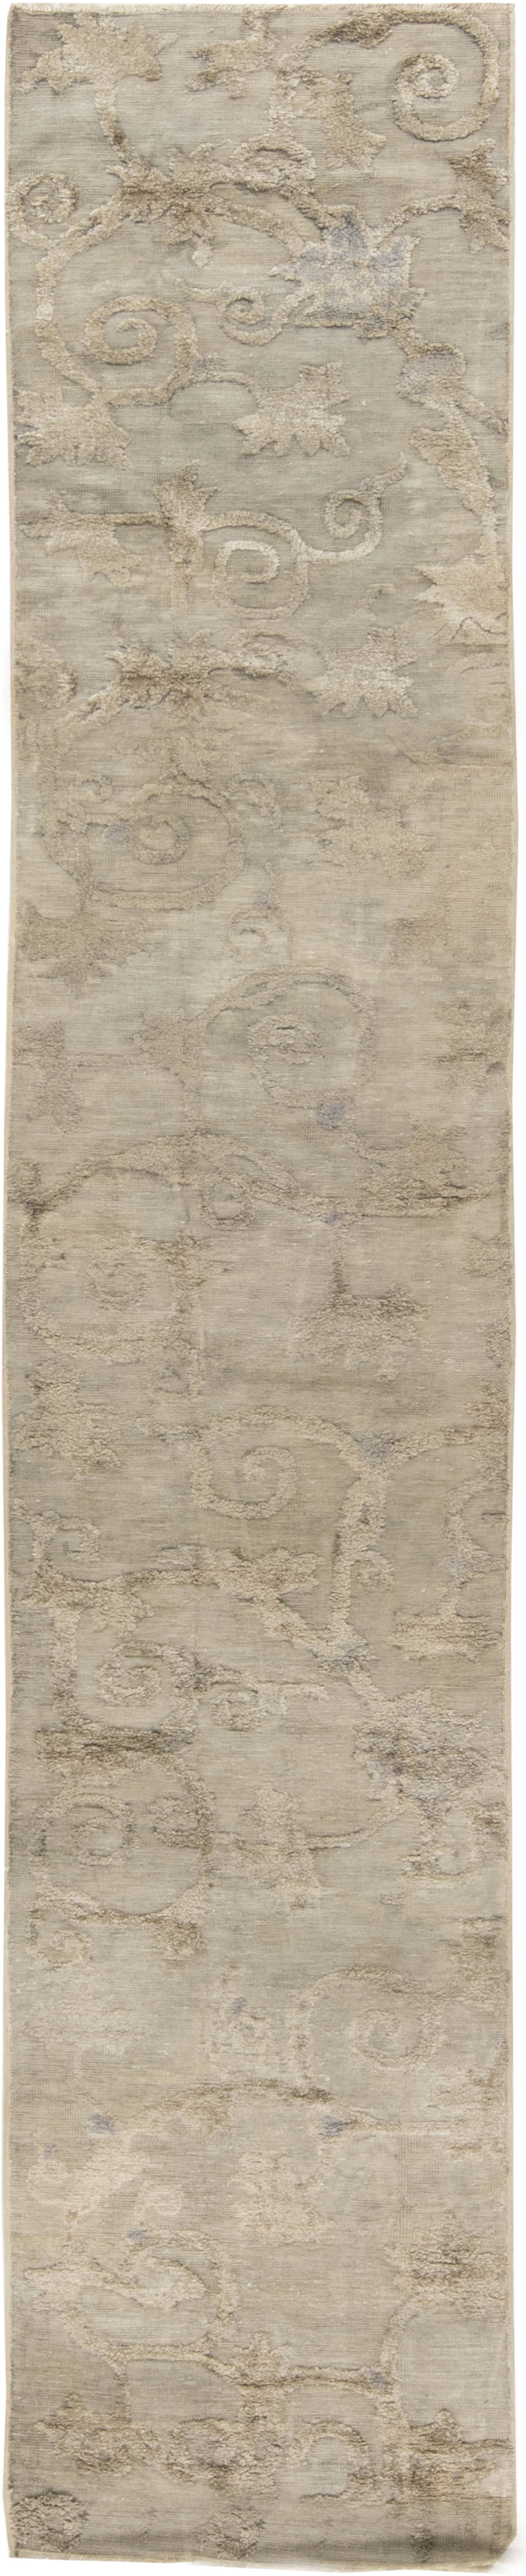 Antique Silk Chinese Runner (fragment) BB6582